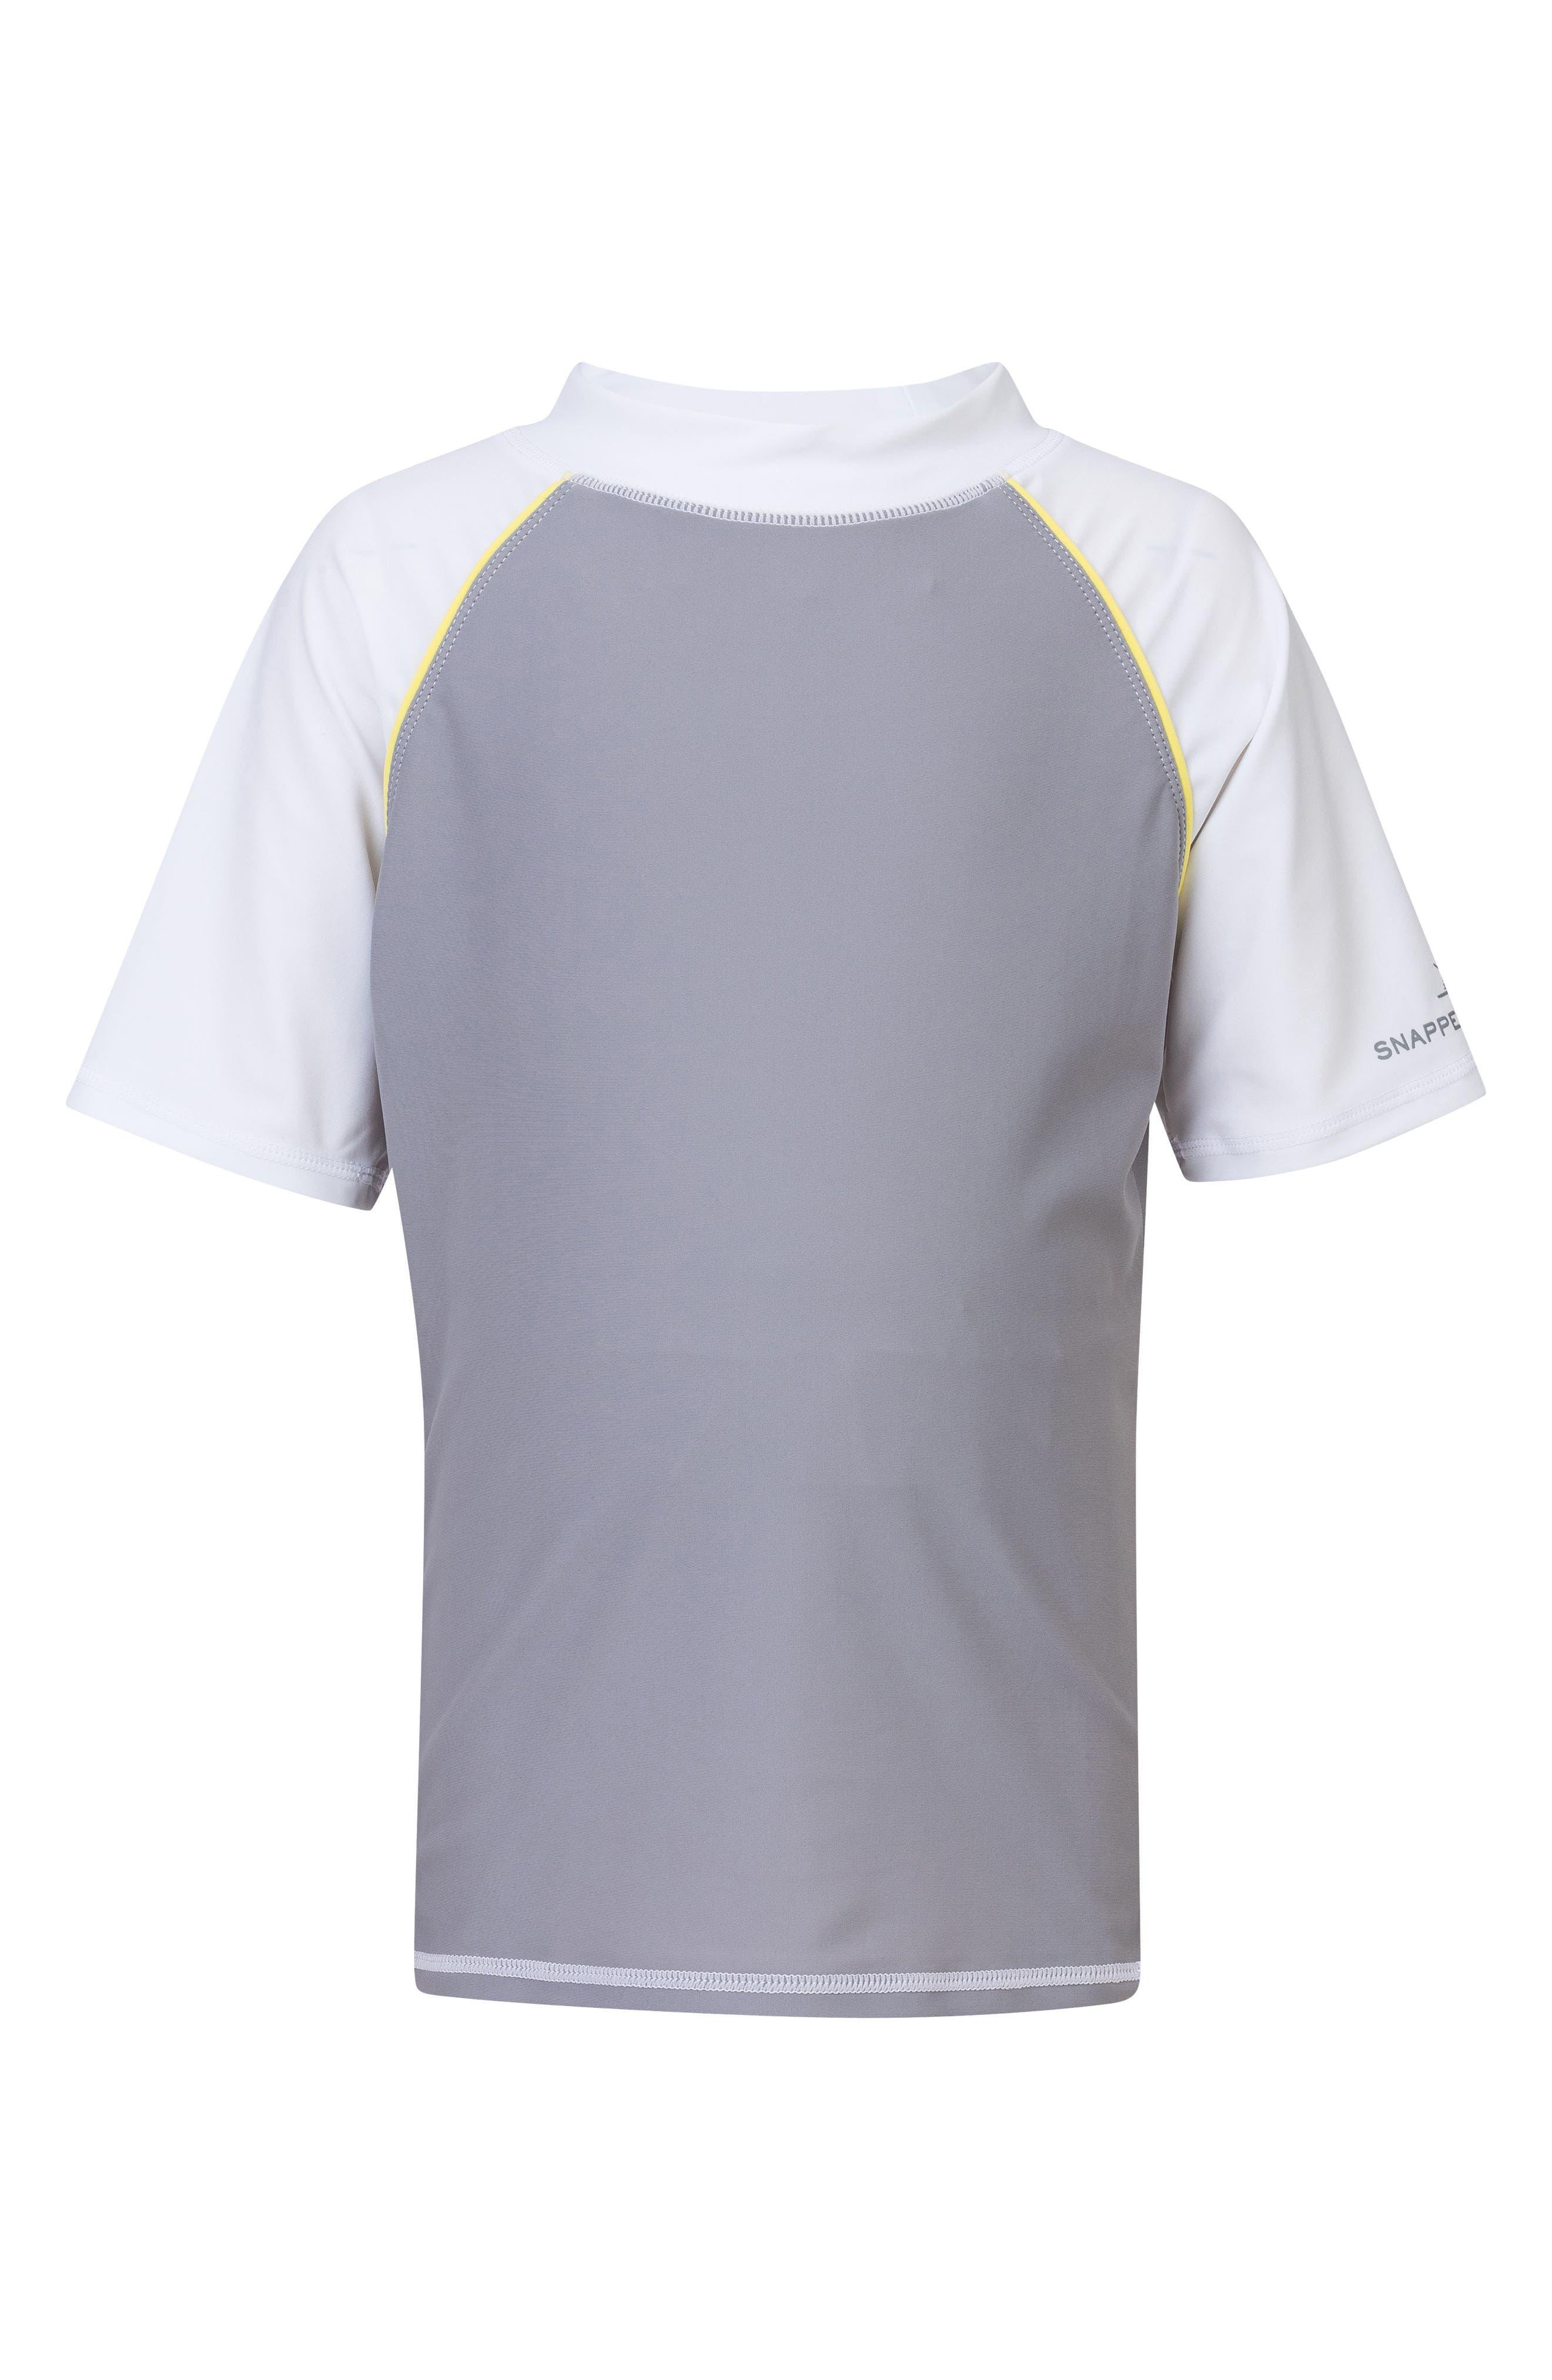 Raglan Short Sleeve Rashguard,                             Main thumbnail 1, color,                             GREY/ WHITE